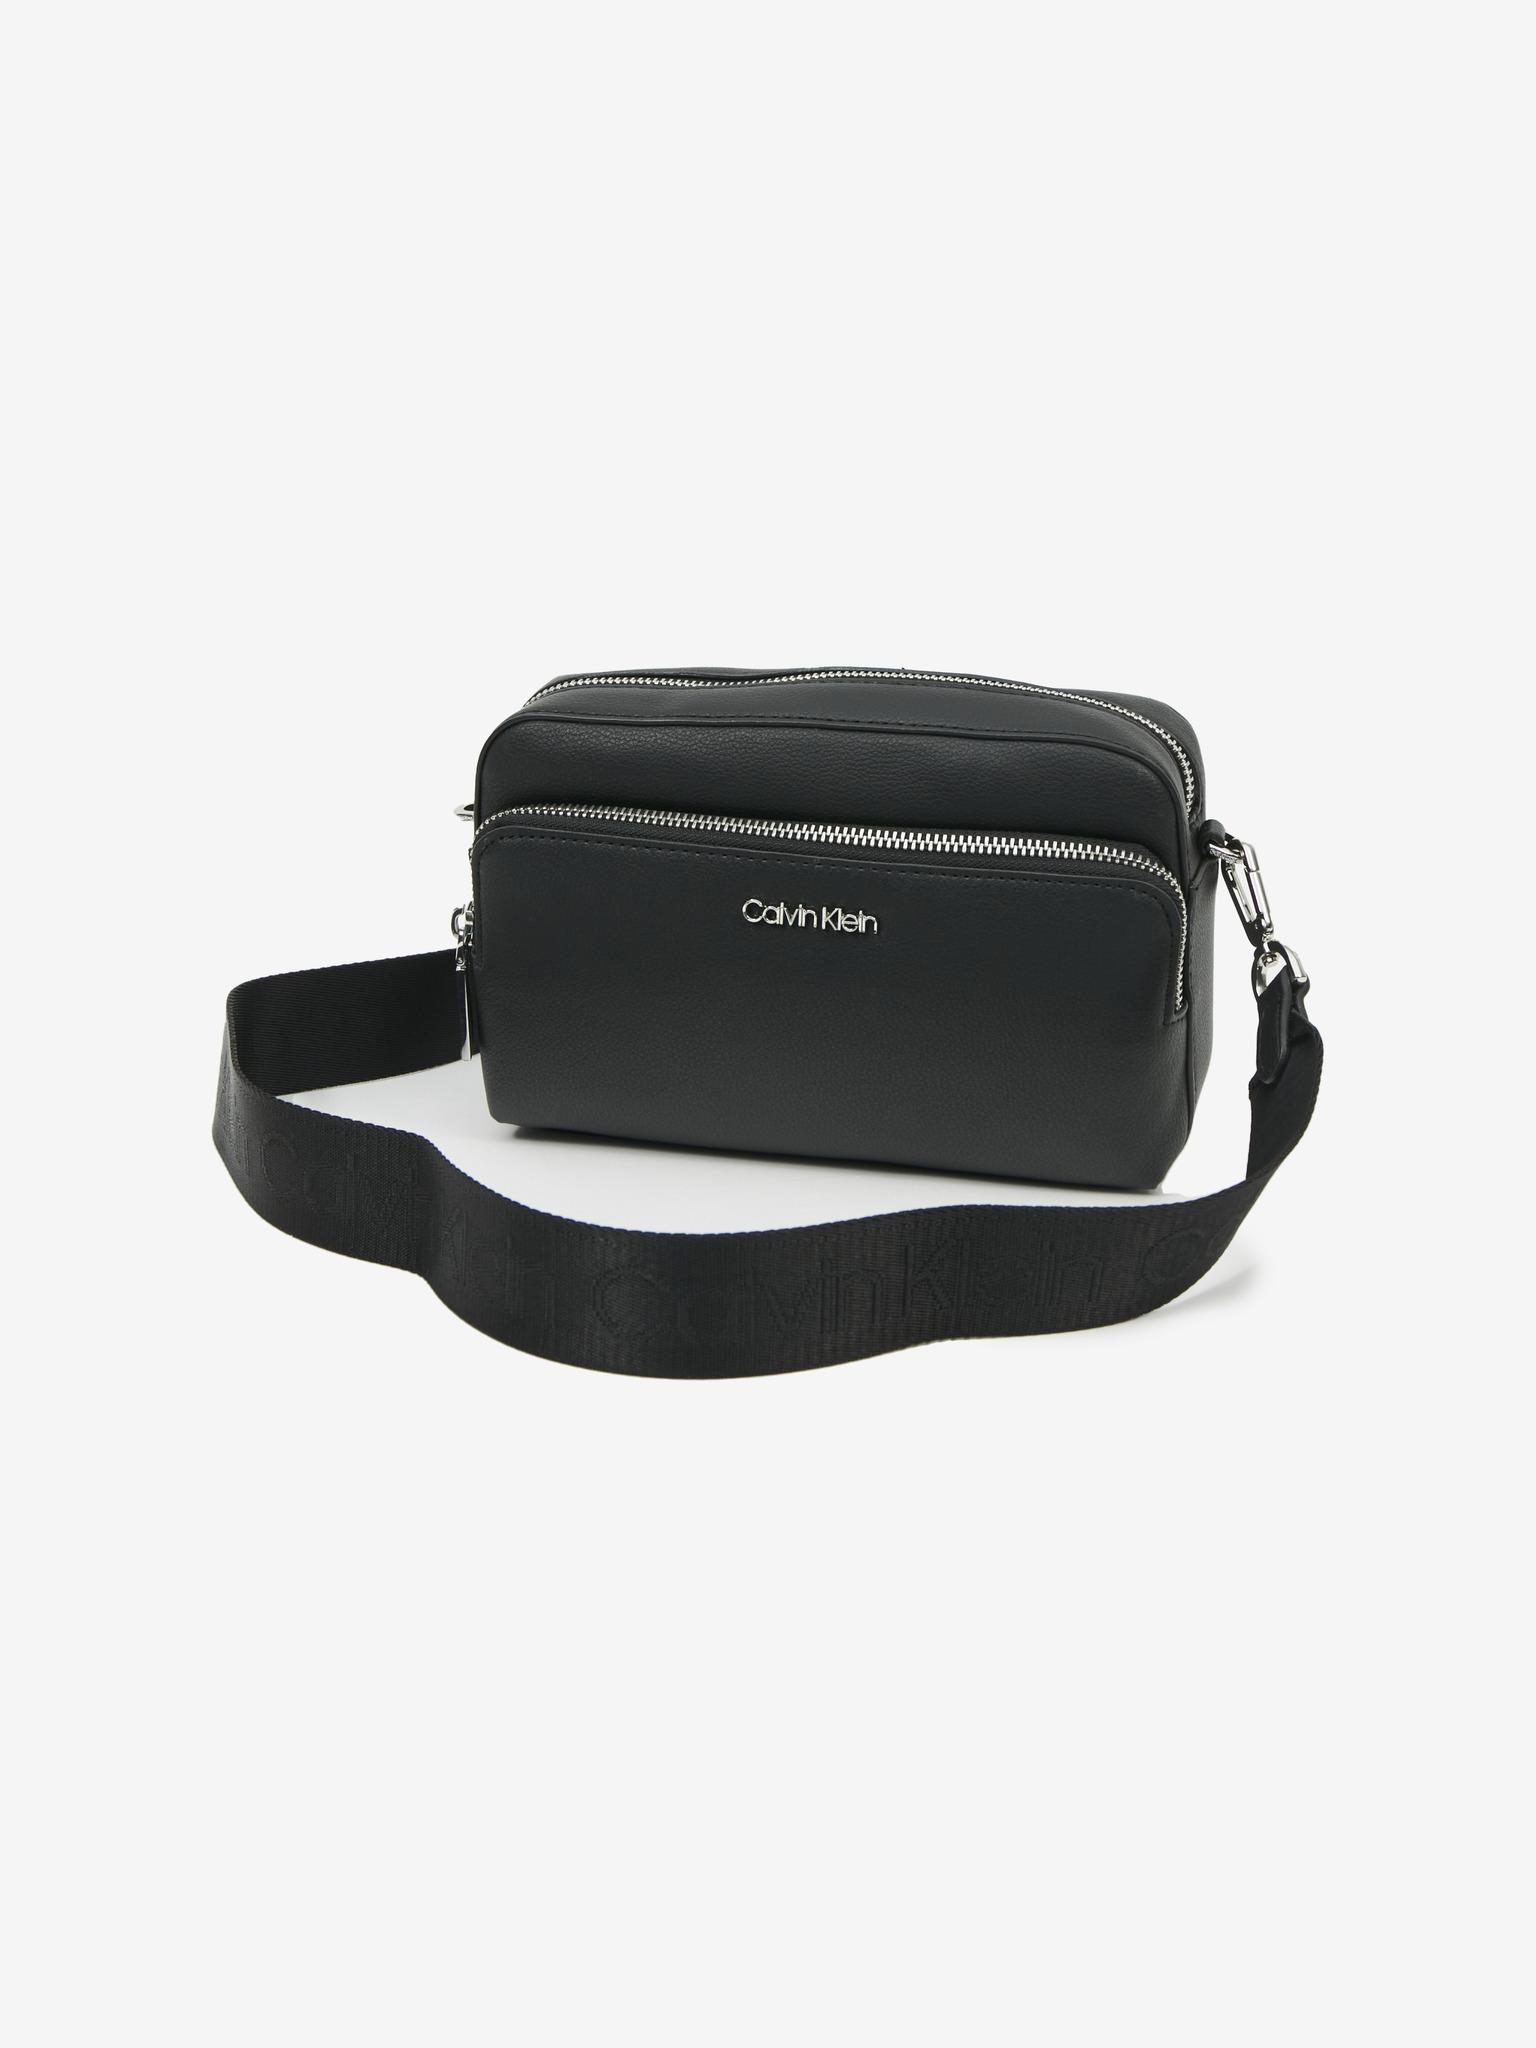 Calvin Klein nero in pelle crossbody borsetta Must Camera